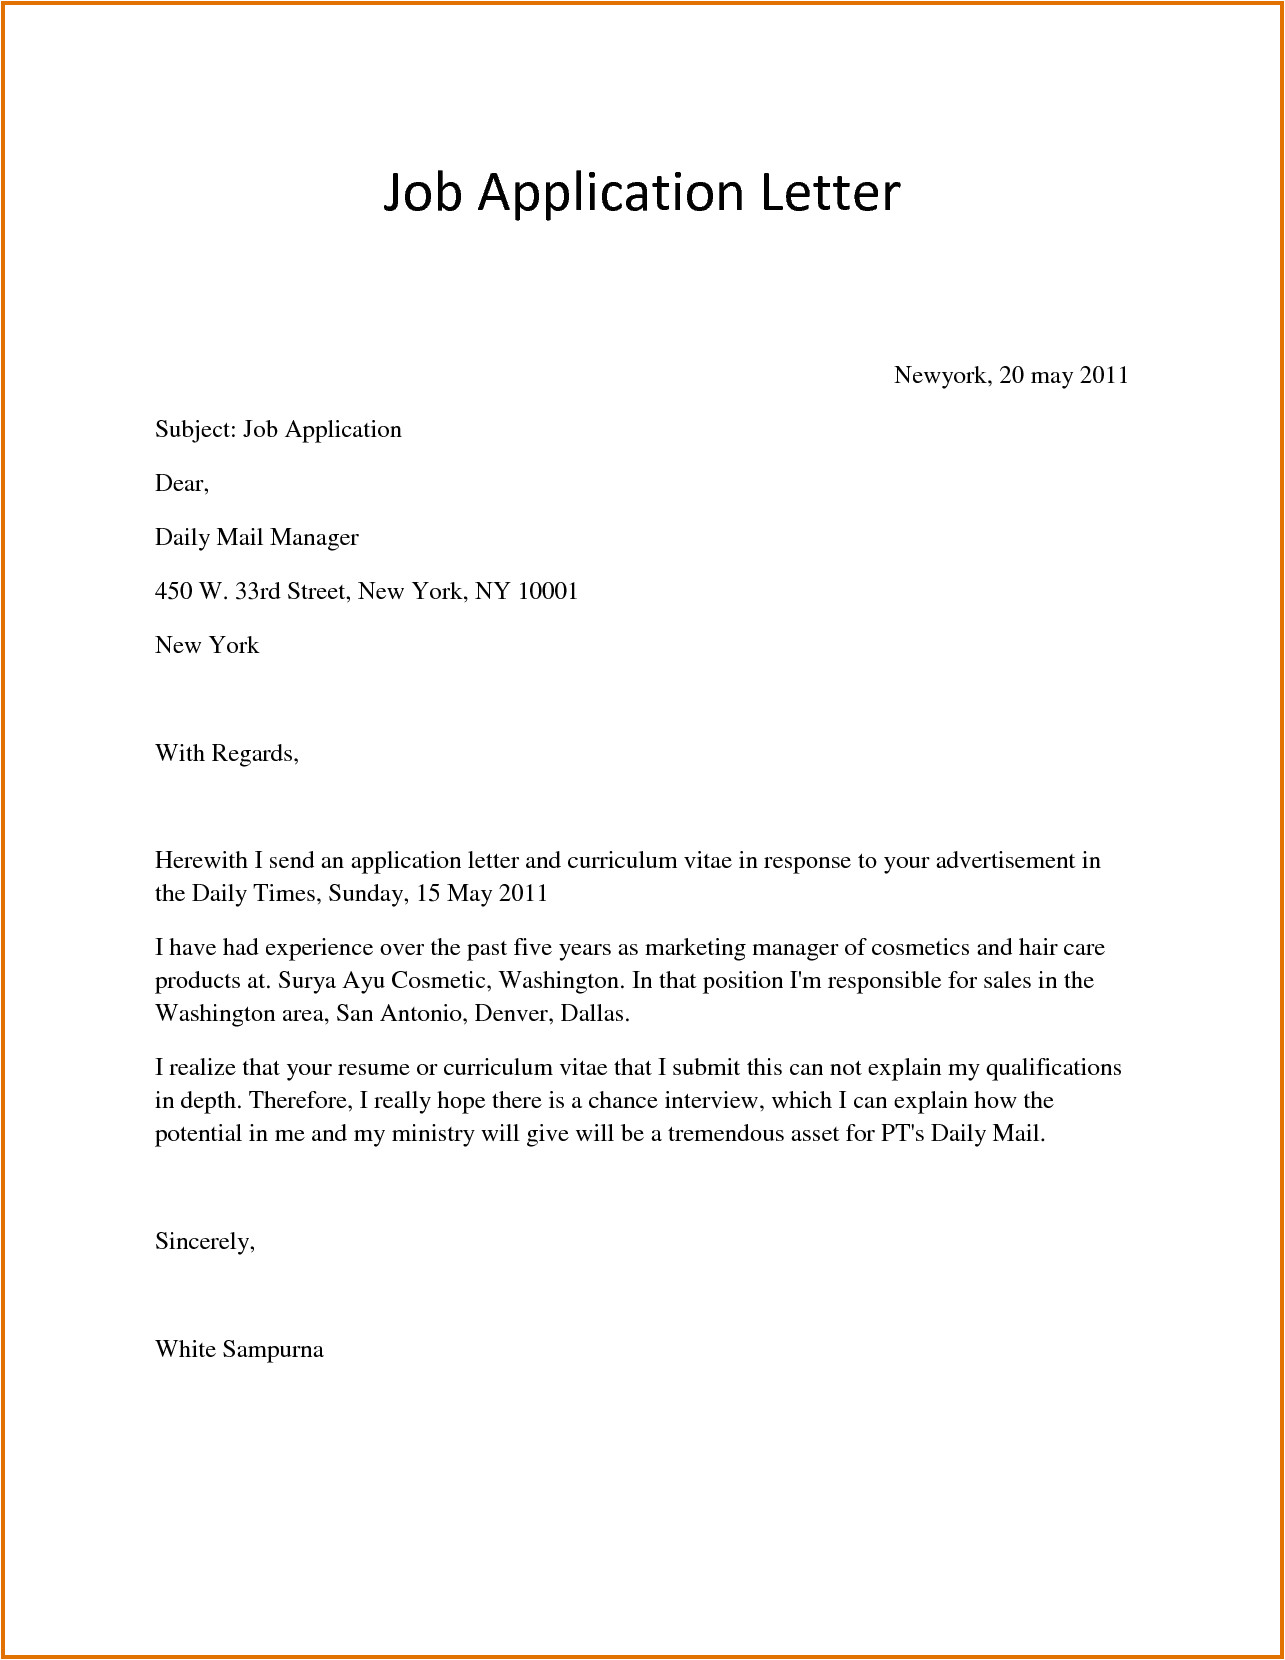 Covering Letter when Applying for A Job Sample Application Letter for Job Applyreference Letters